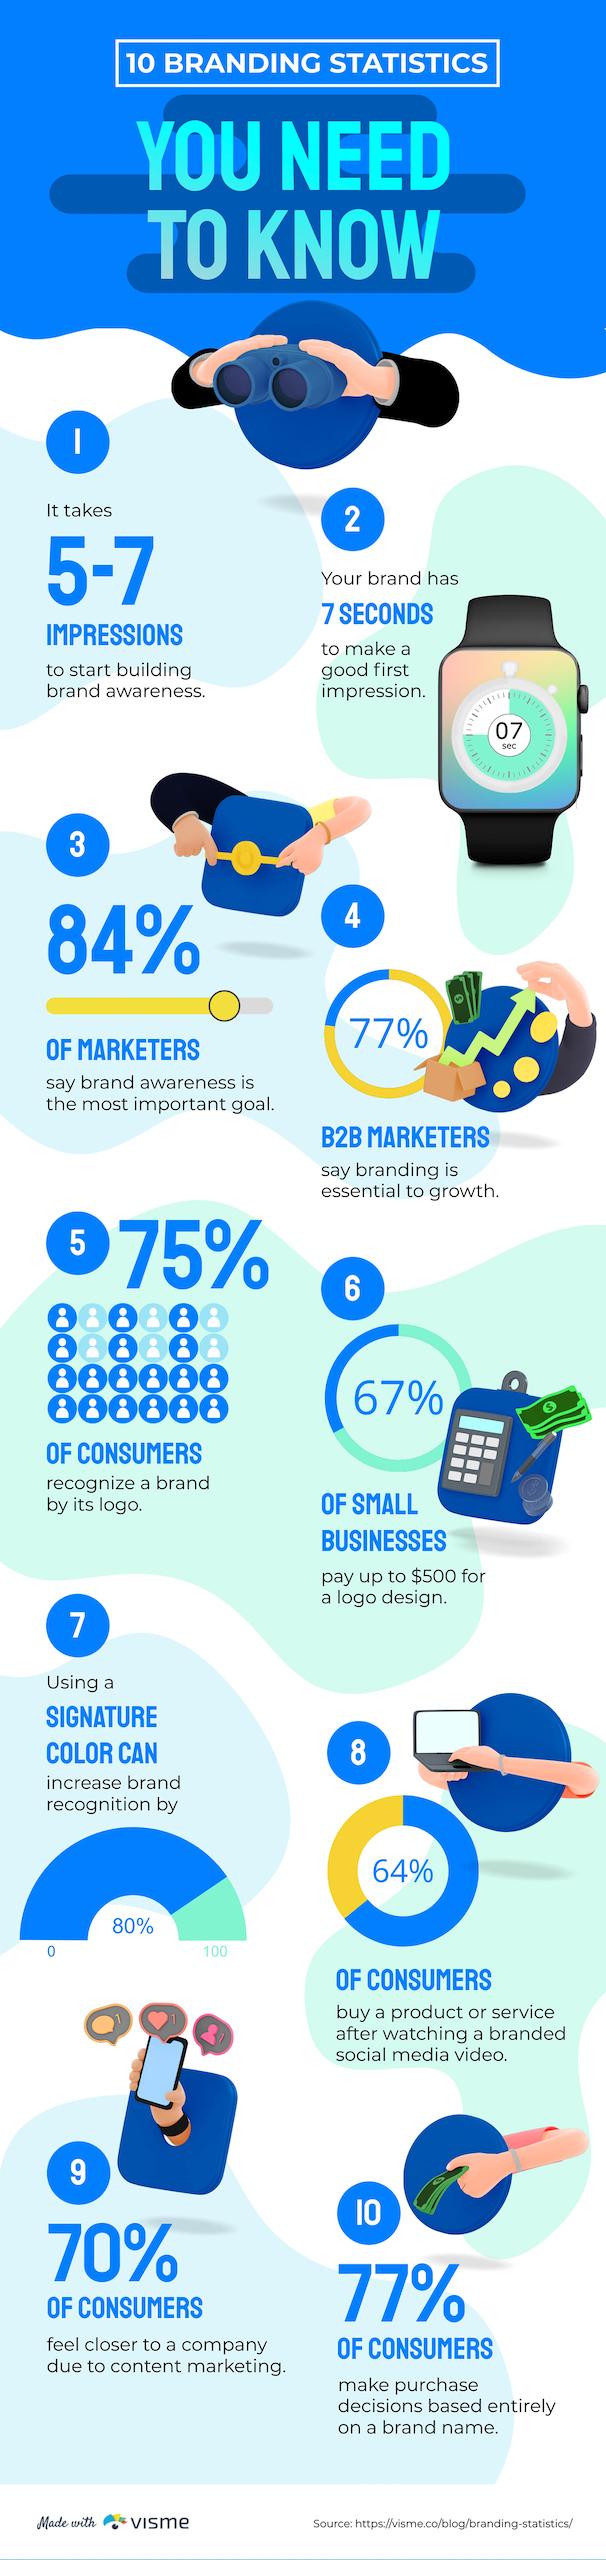 An infographic showing off the top ten branding statistics.